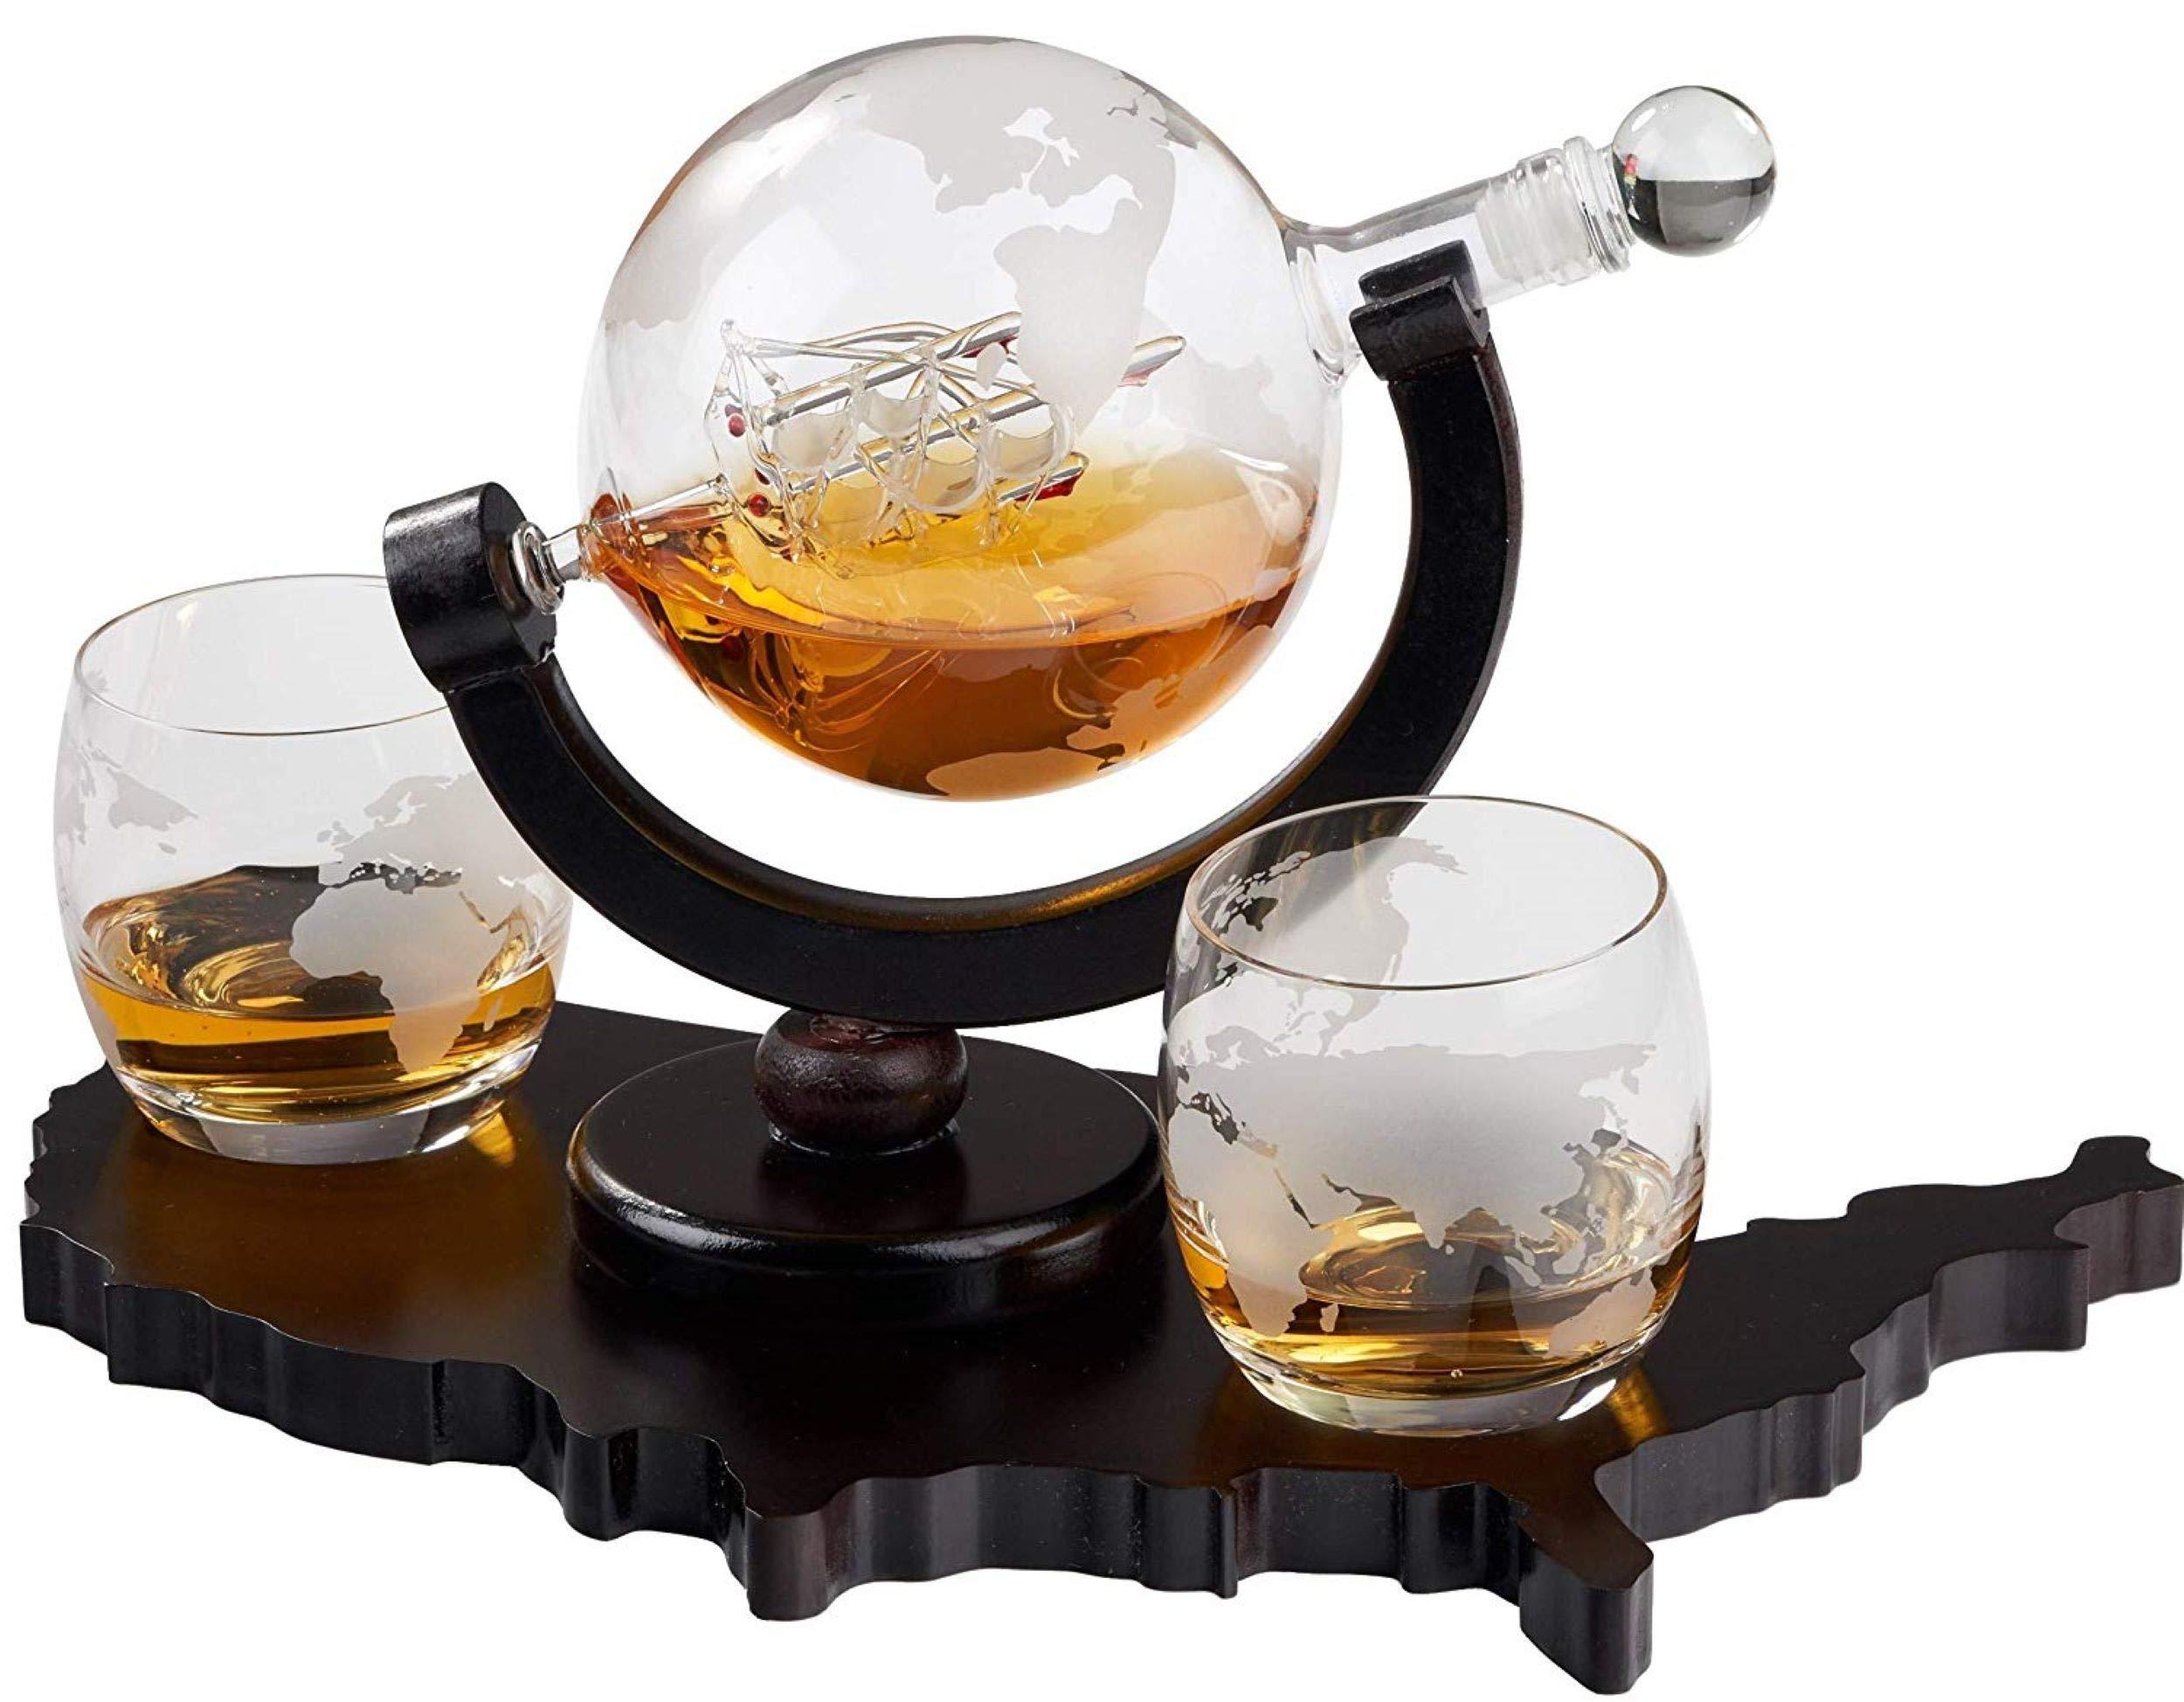 Whiskey Decanter Set World Etched Globe Decanter Airtight Stopper Antique Ship Liquor Dispenser Perfect Bar Gift Bourbon Scotch Vodka Liquor USA Map Tray 850 ml by Bezrat (Image #1)